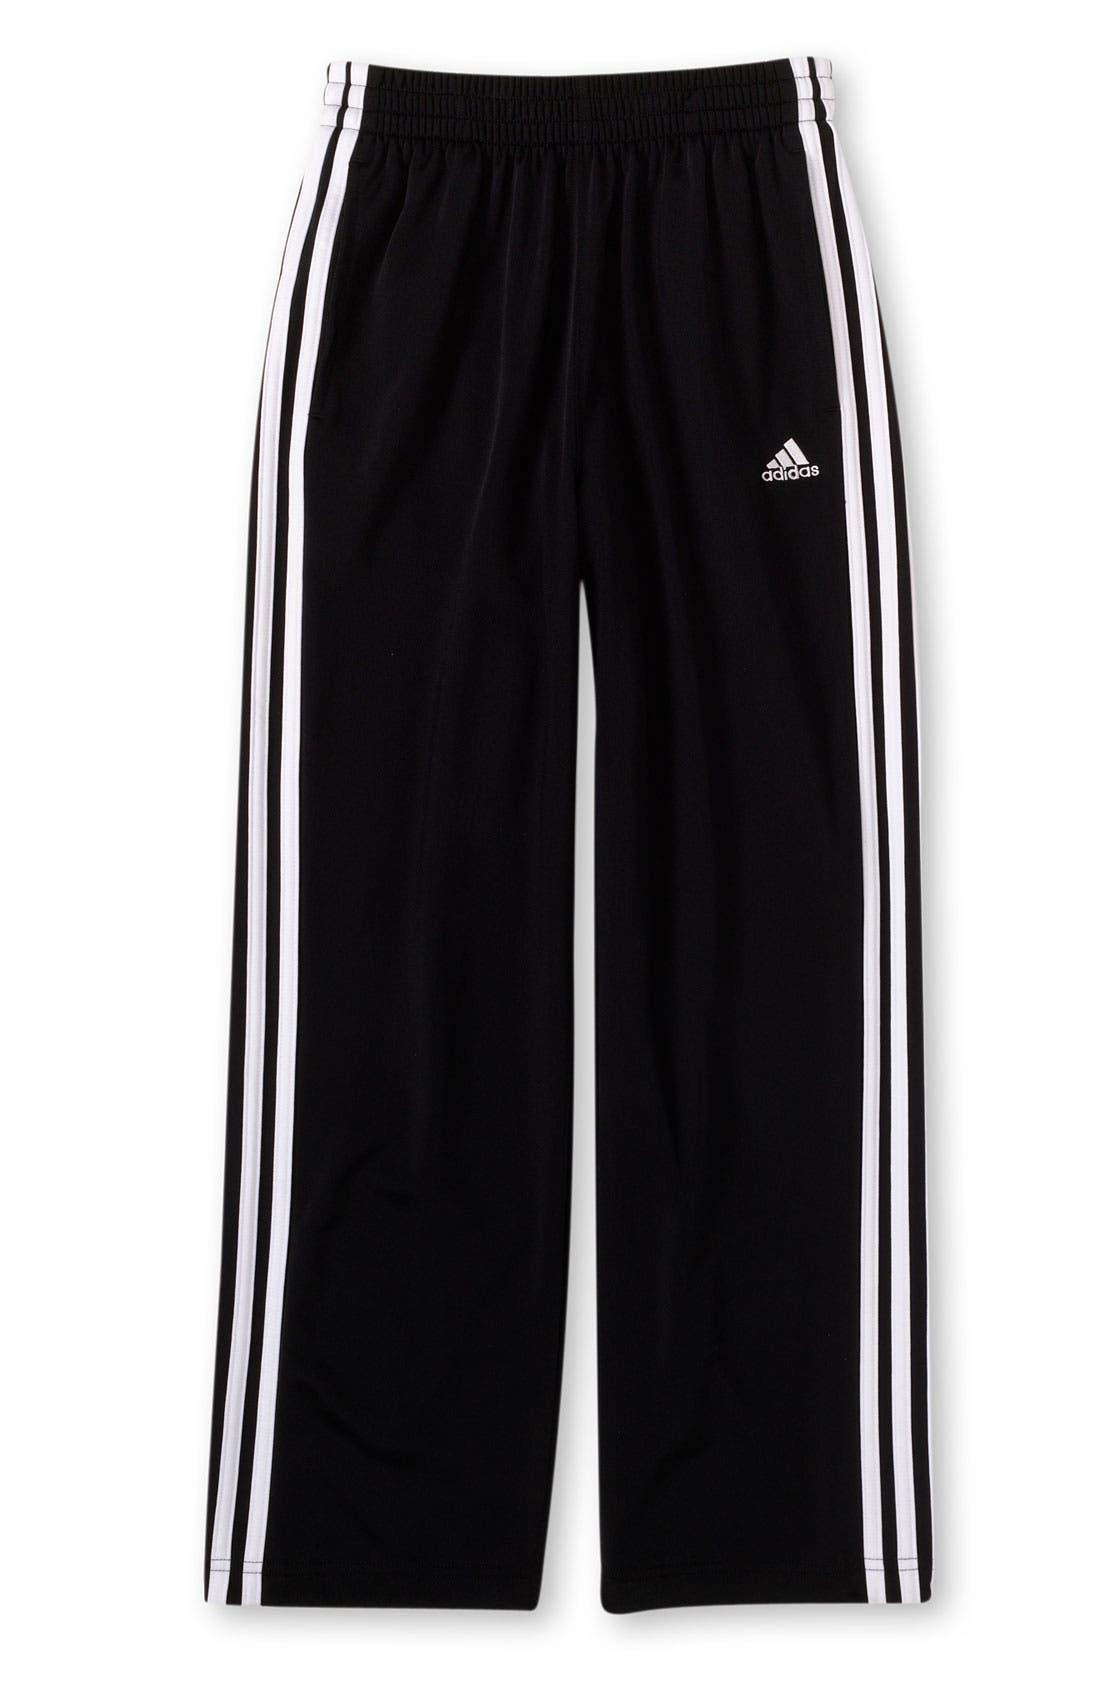 Alternate Image 1 Selected - adidas 3-Stripes Pants (Big Boys)